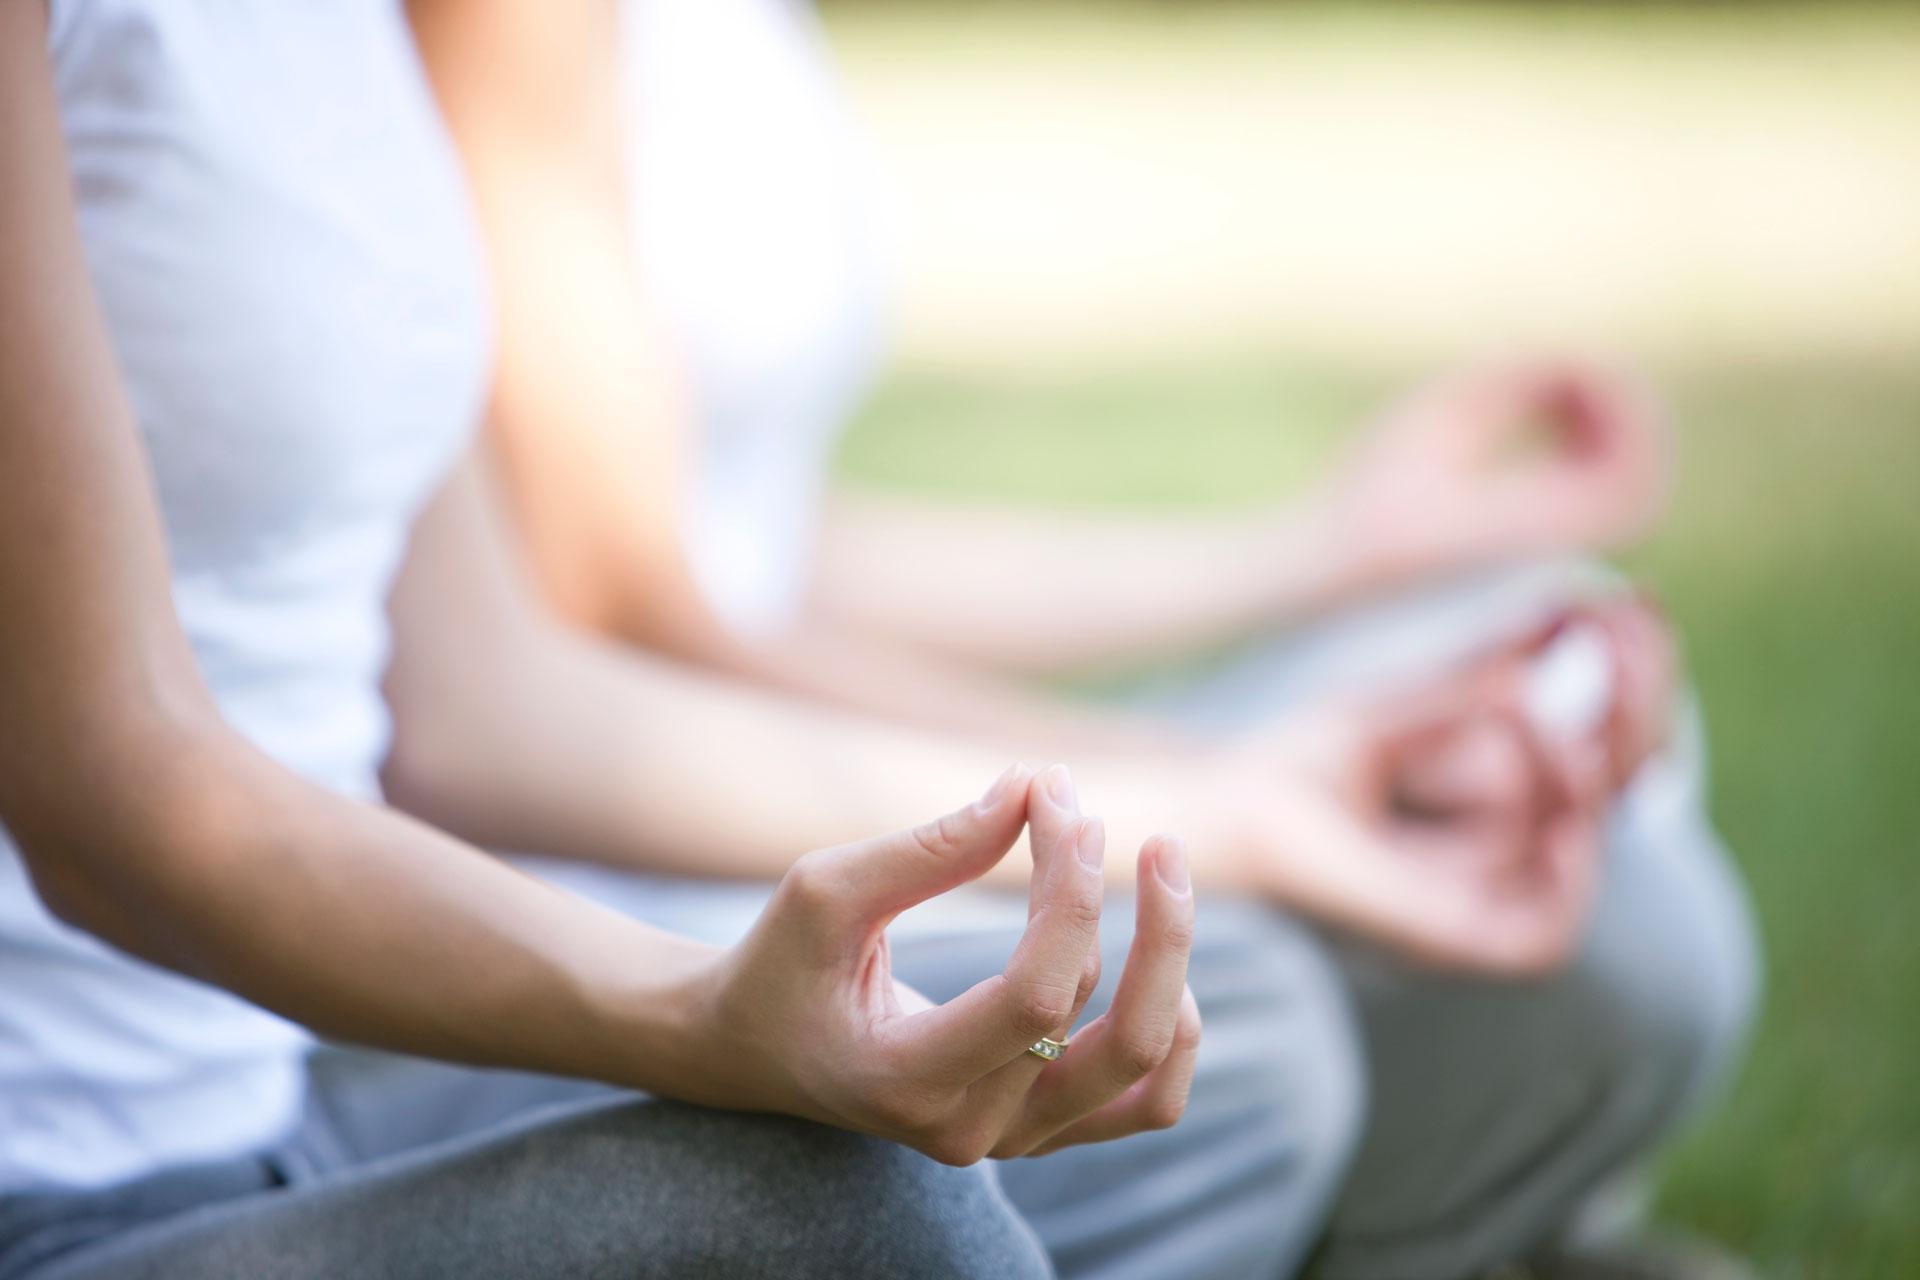 Image via Breathe Mindfulness Centre